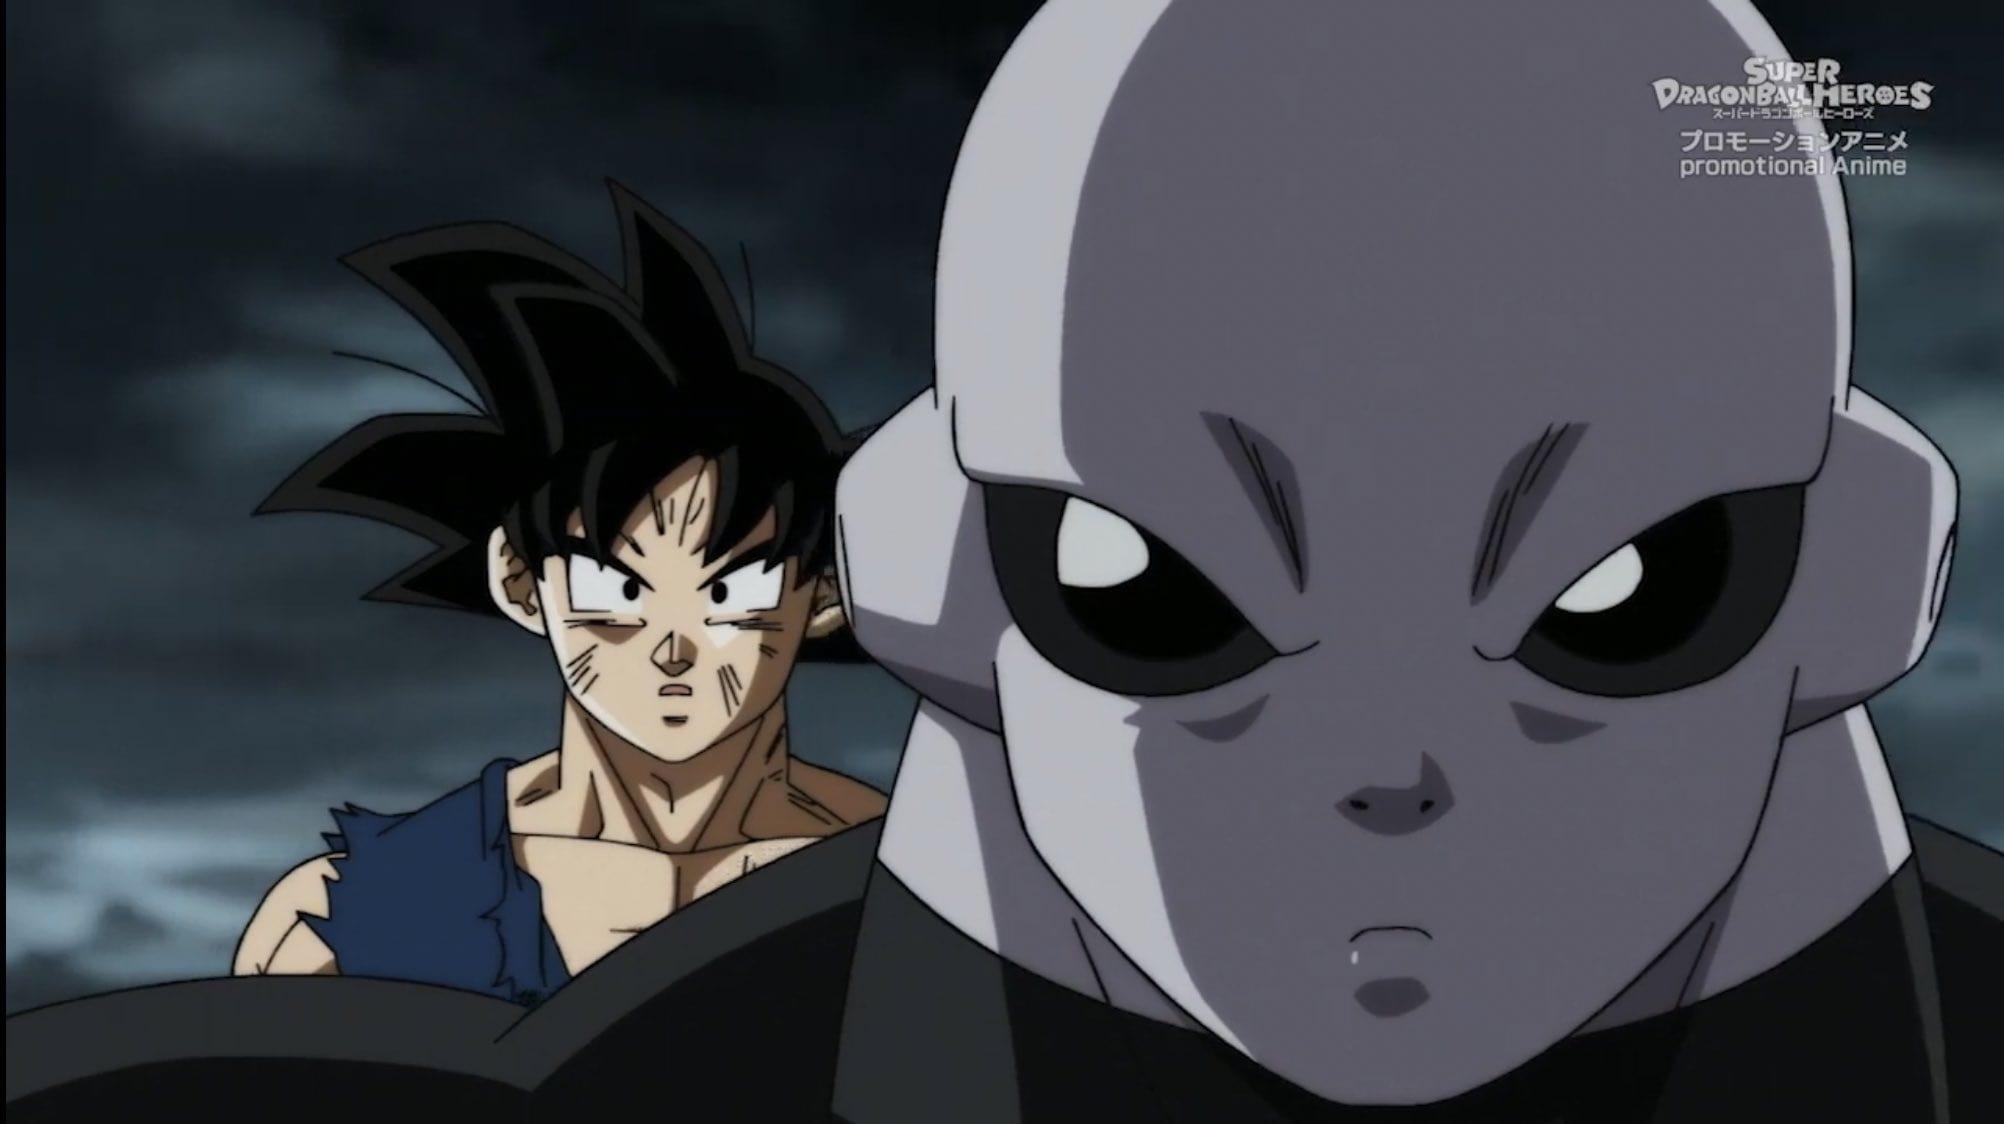 Dragon Ball Heroes Episode 17 watch online